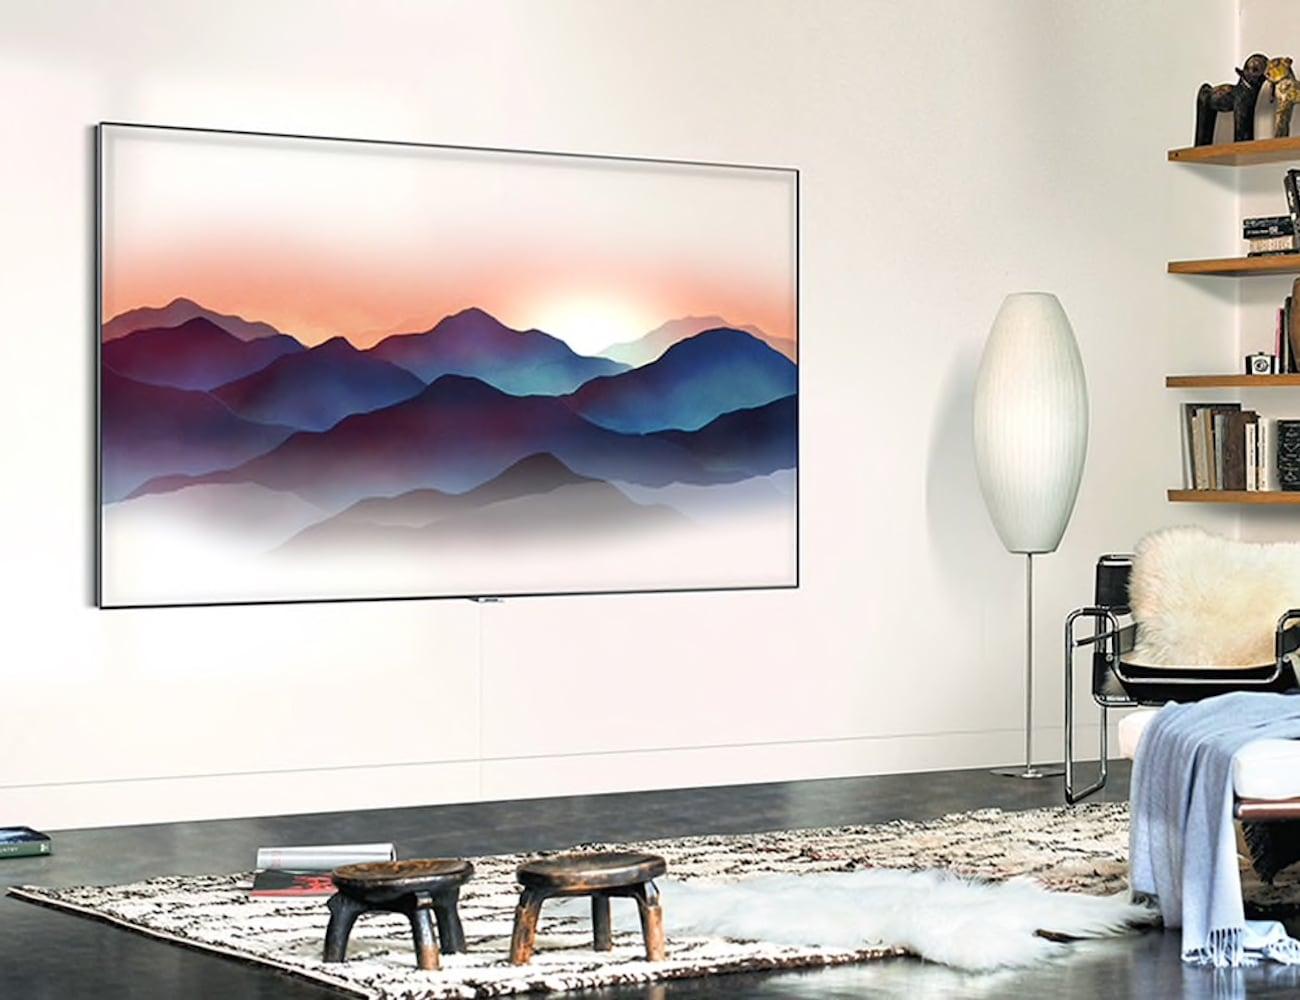 Samsung QLED Smart 4K UHD TV offers over a billion shades of Qi color